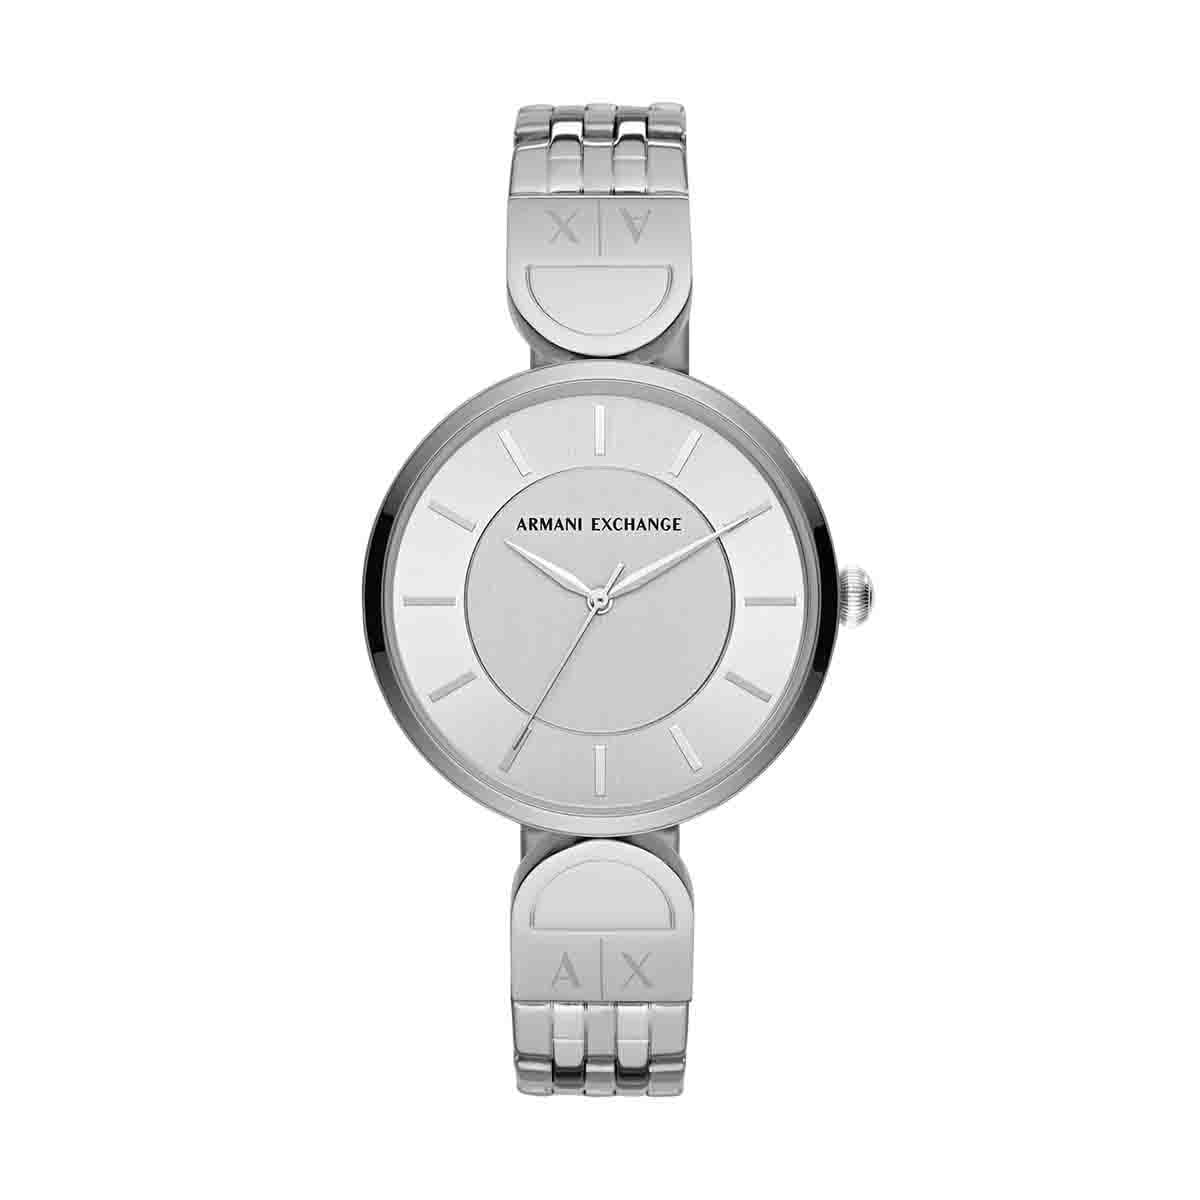 9dd0b5d10379 Reloj para dama color plata armani exchange